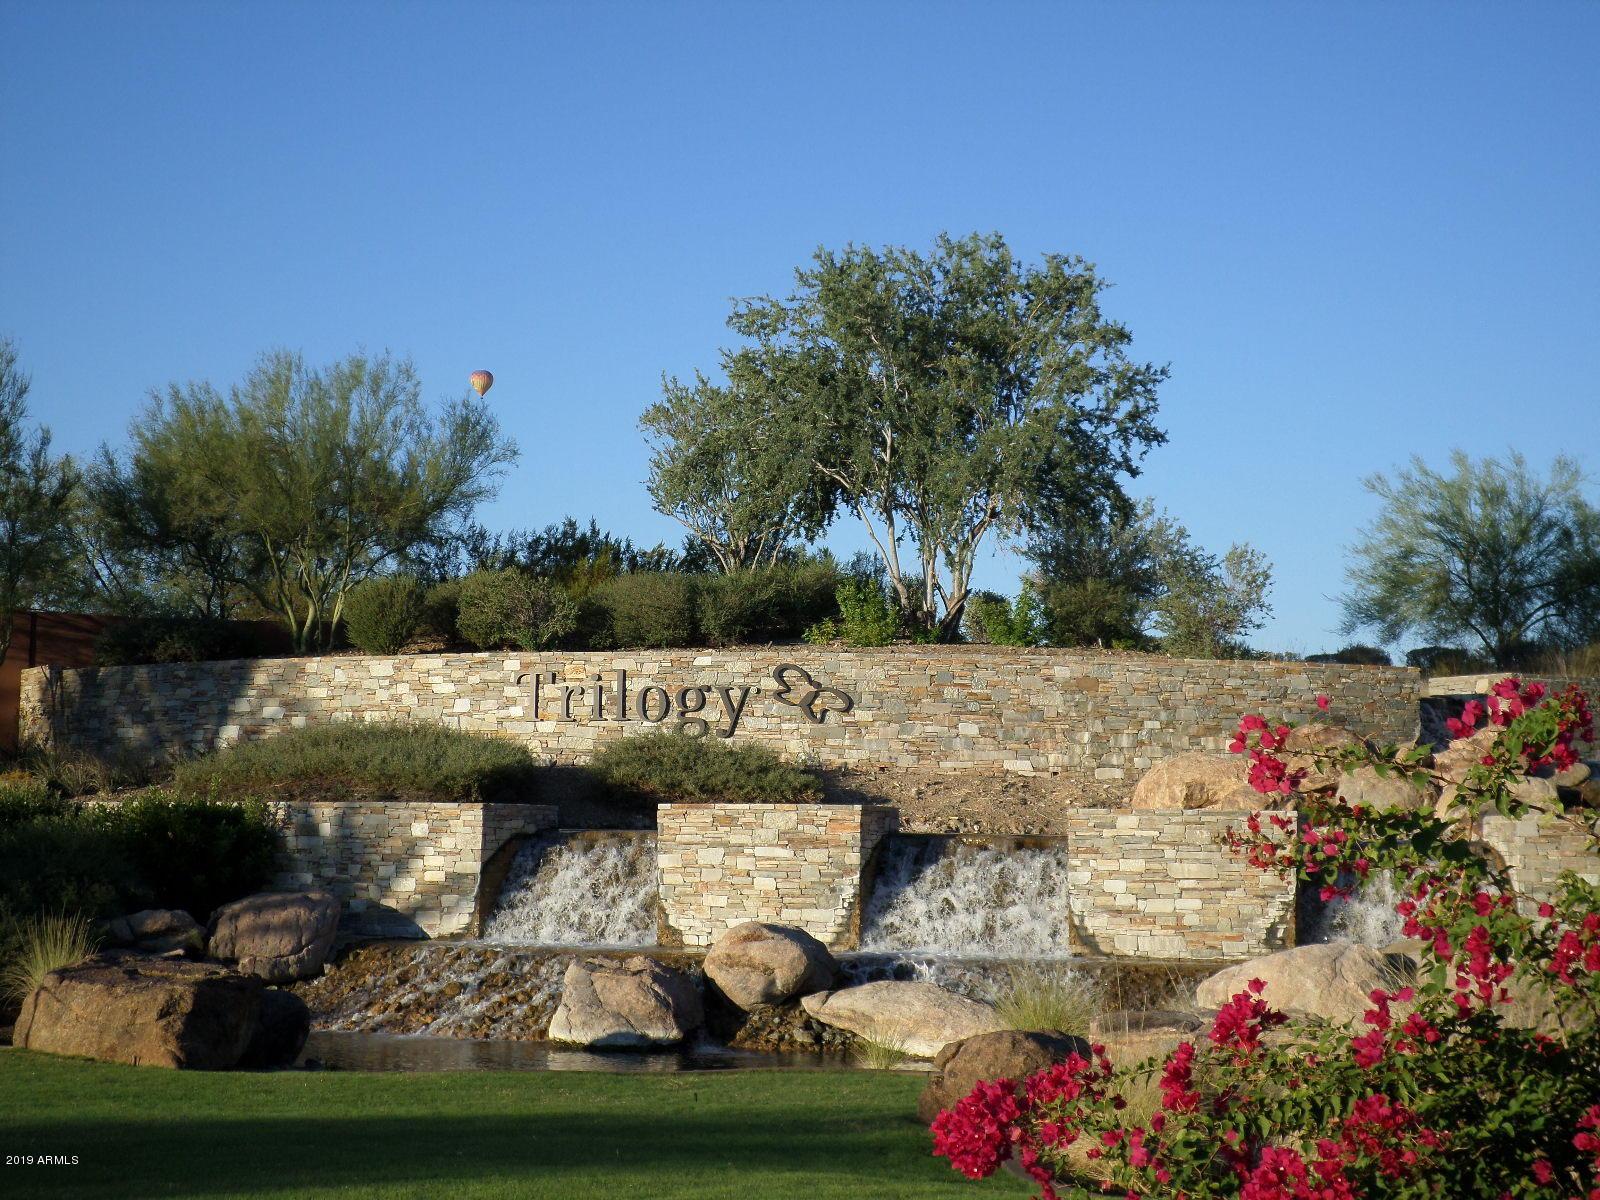 MLS 5940677 27250 N 127TH Drive, Peoria, AZ 85383 Peoria AZ Trilogy At Vistancia